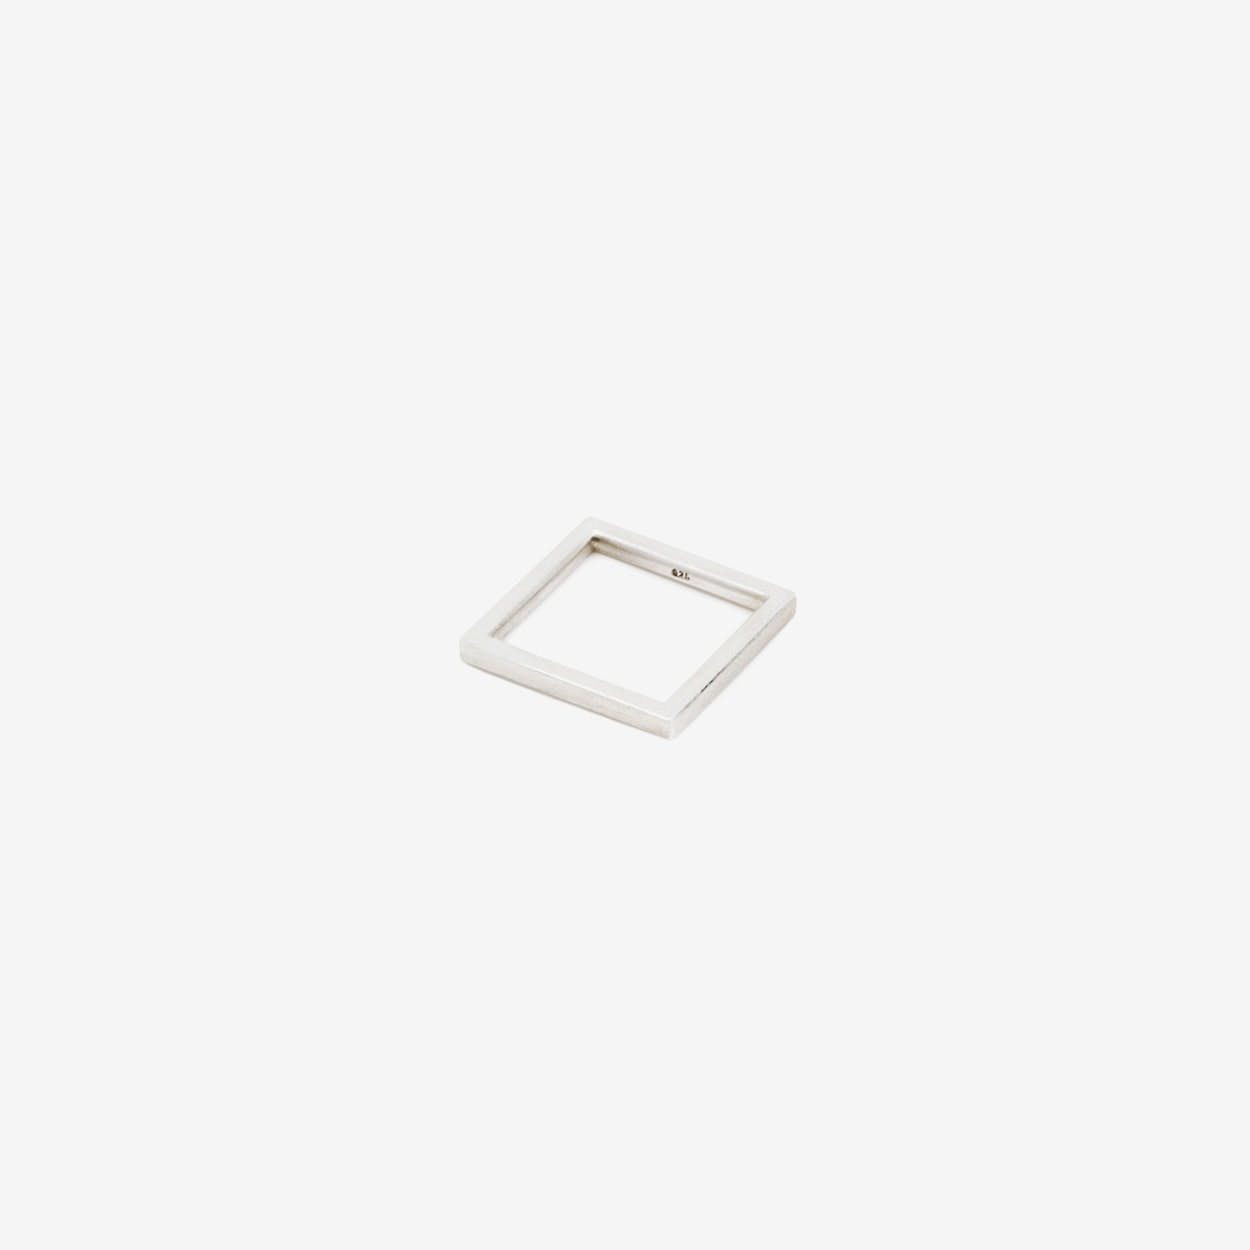 SQUARE Ring in Silver 2 - B KREB